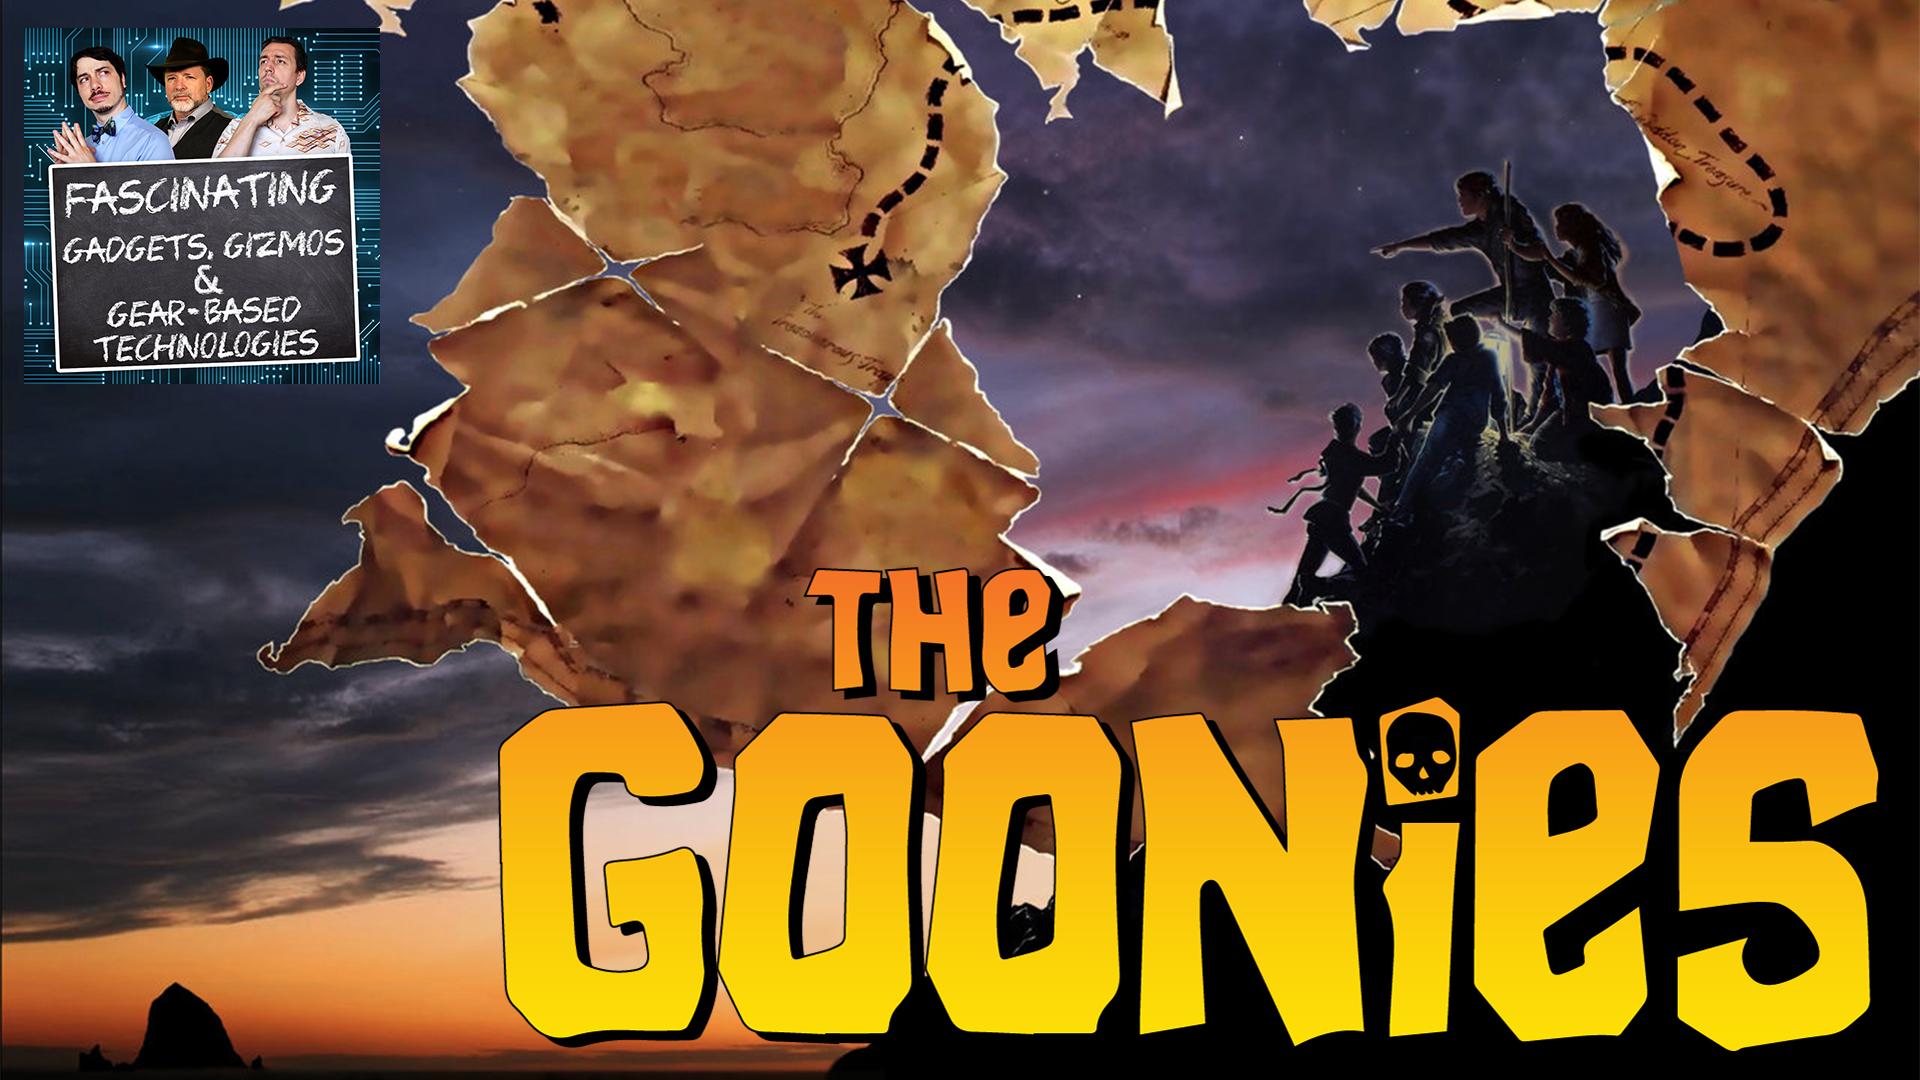 Ep. 83 The Goonies